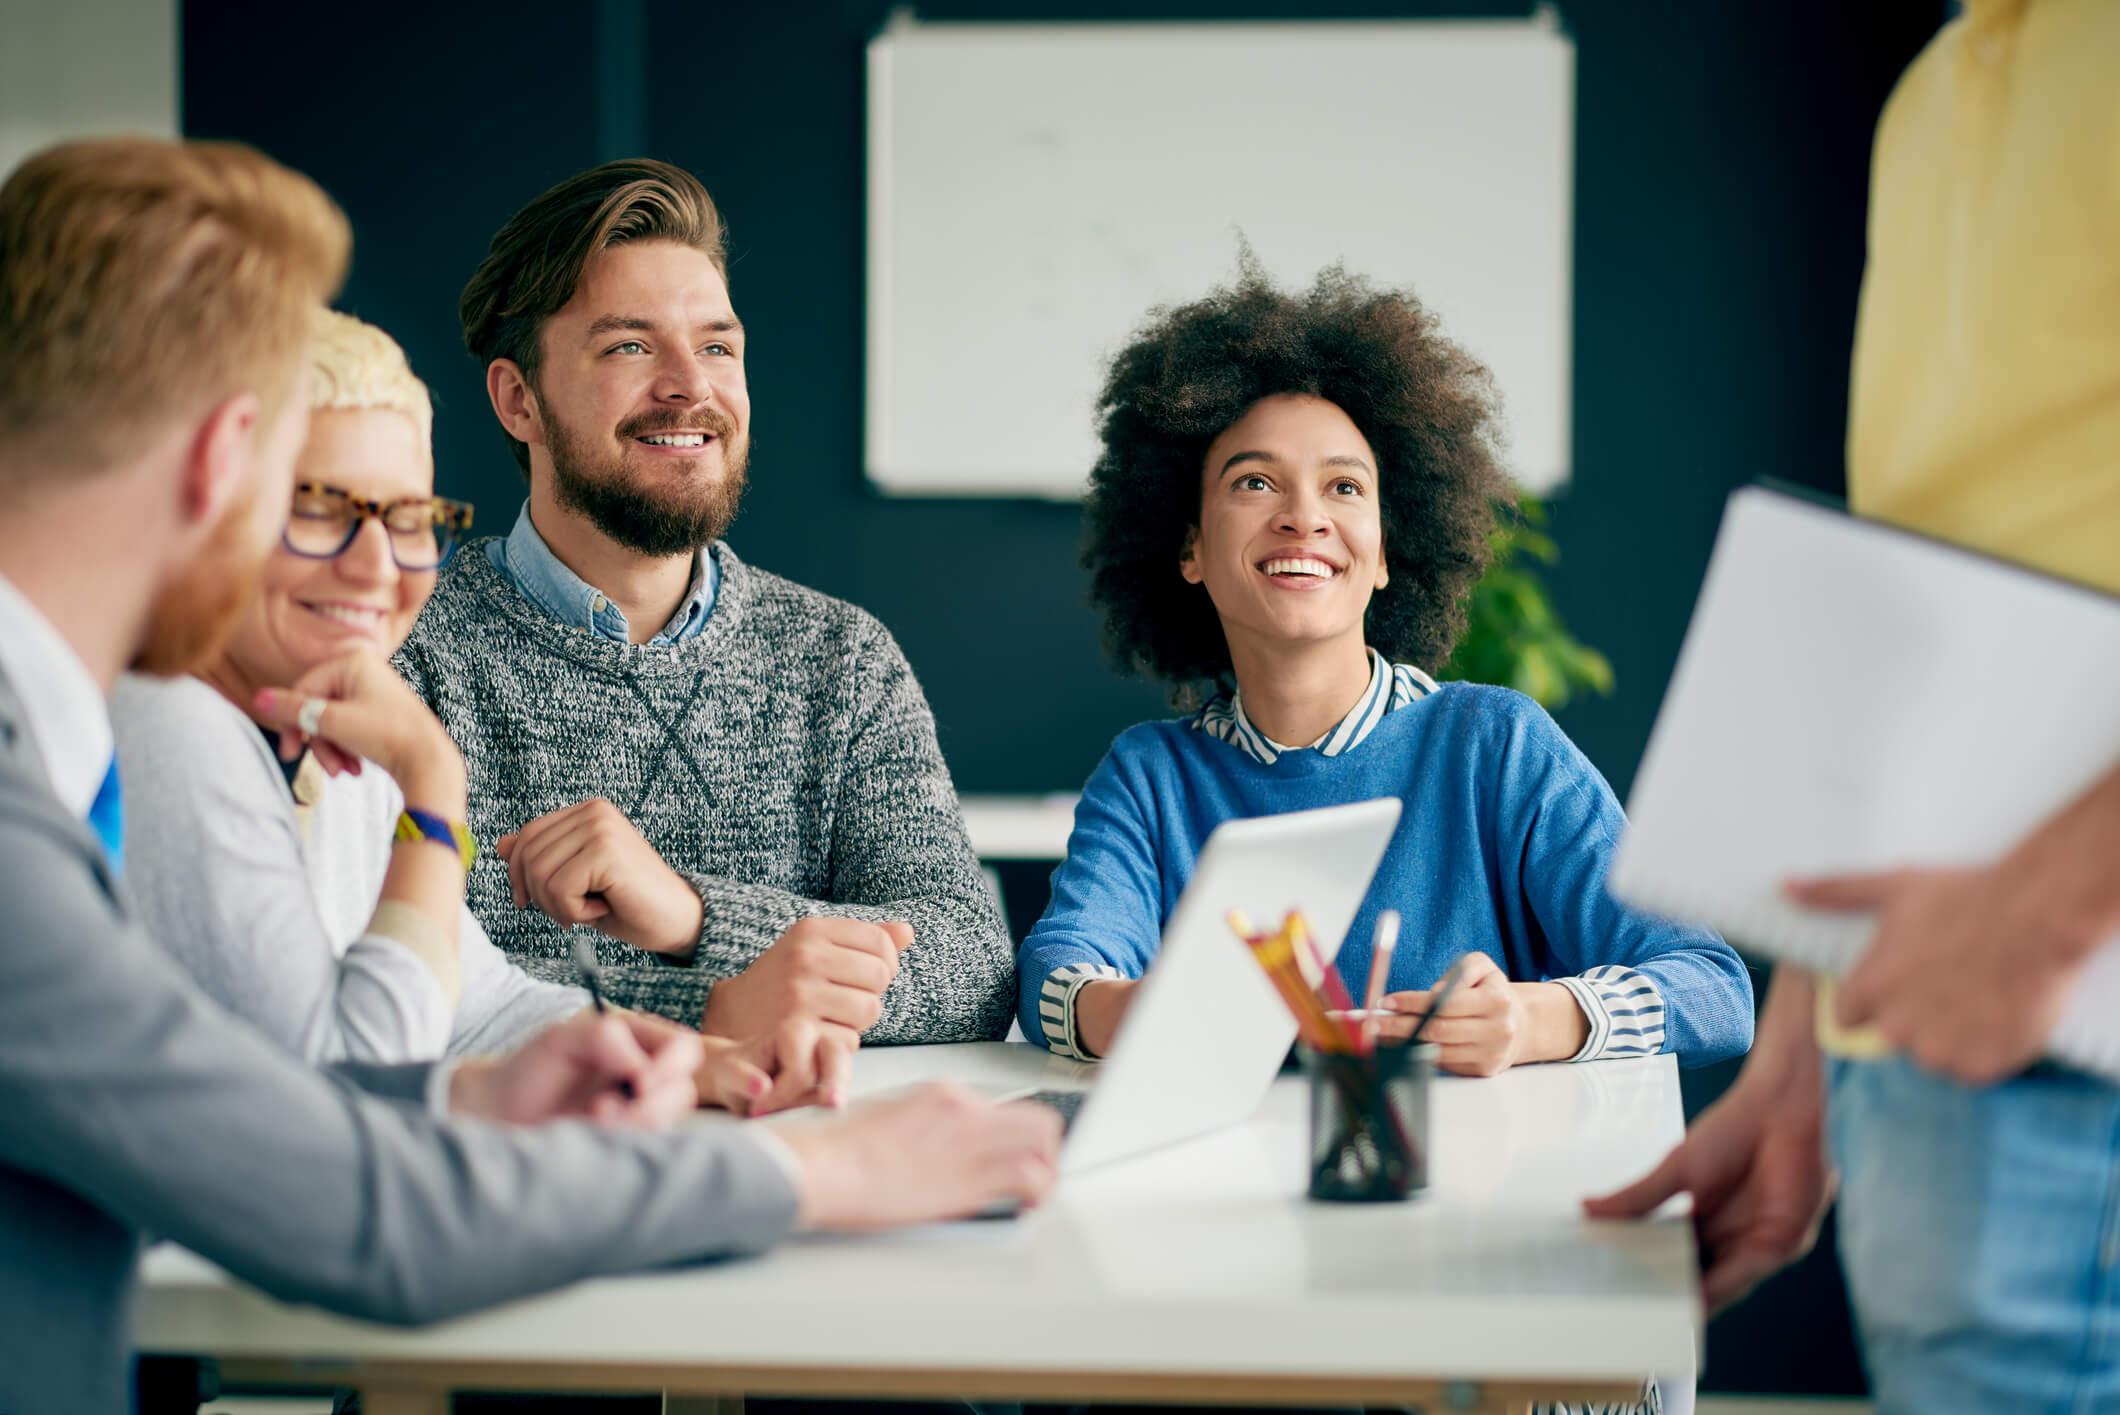 Careers - Core Values That Define Us